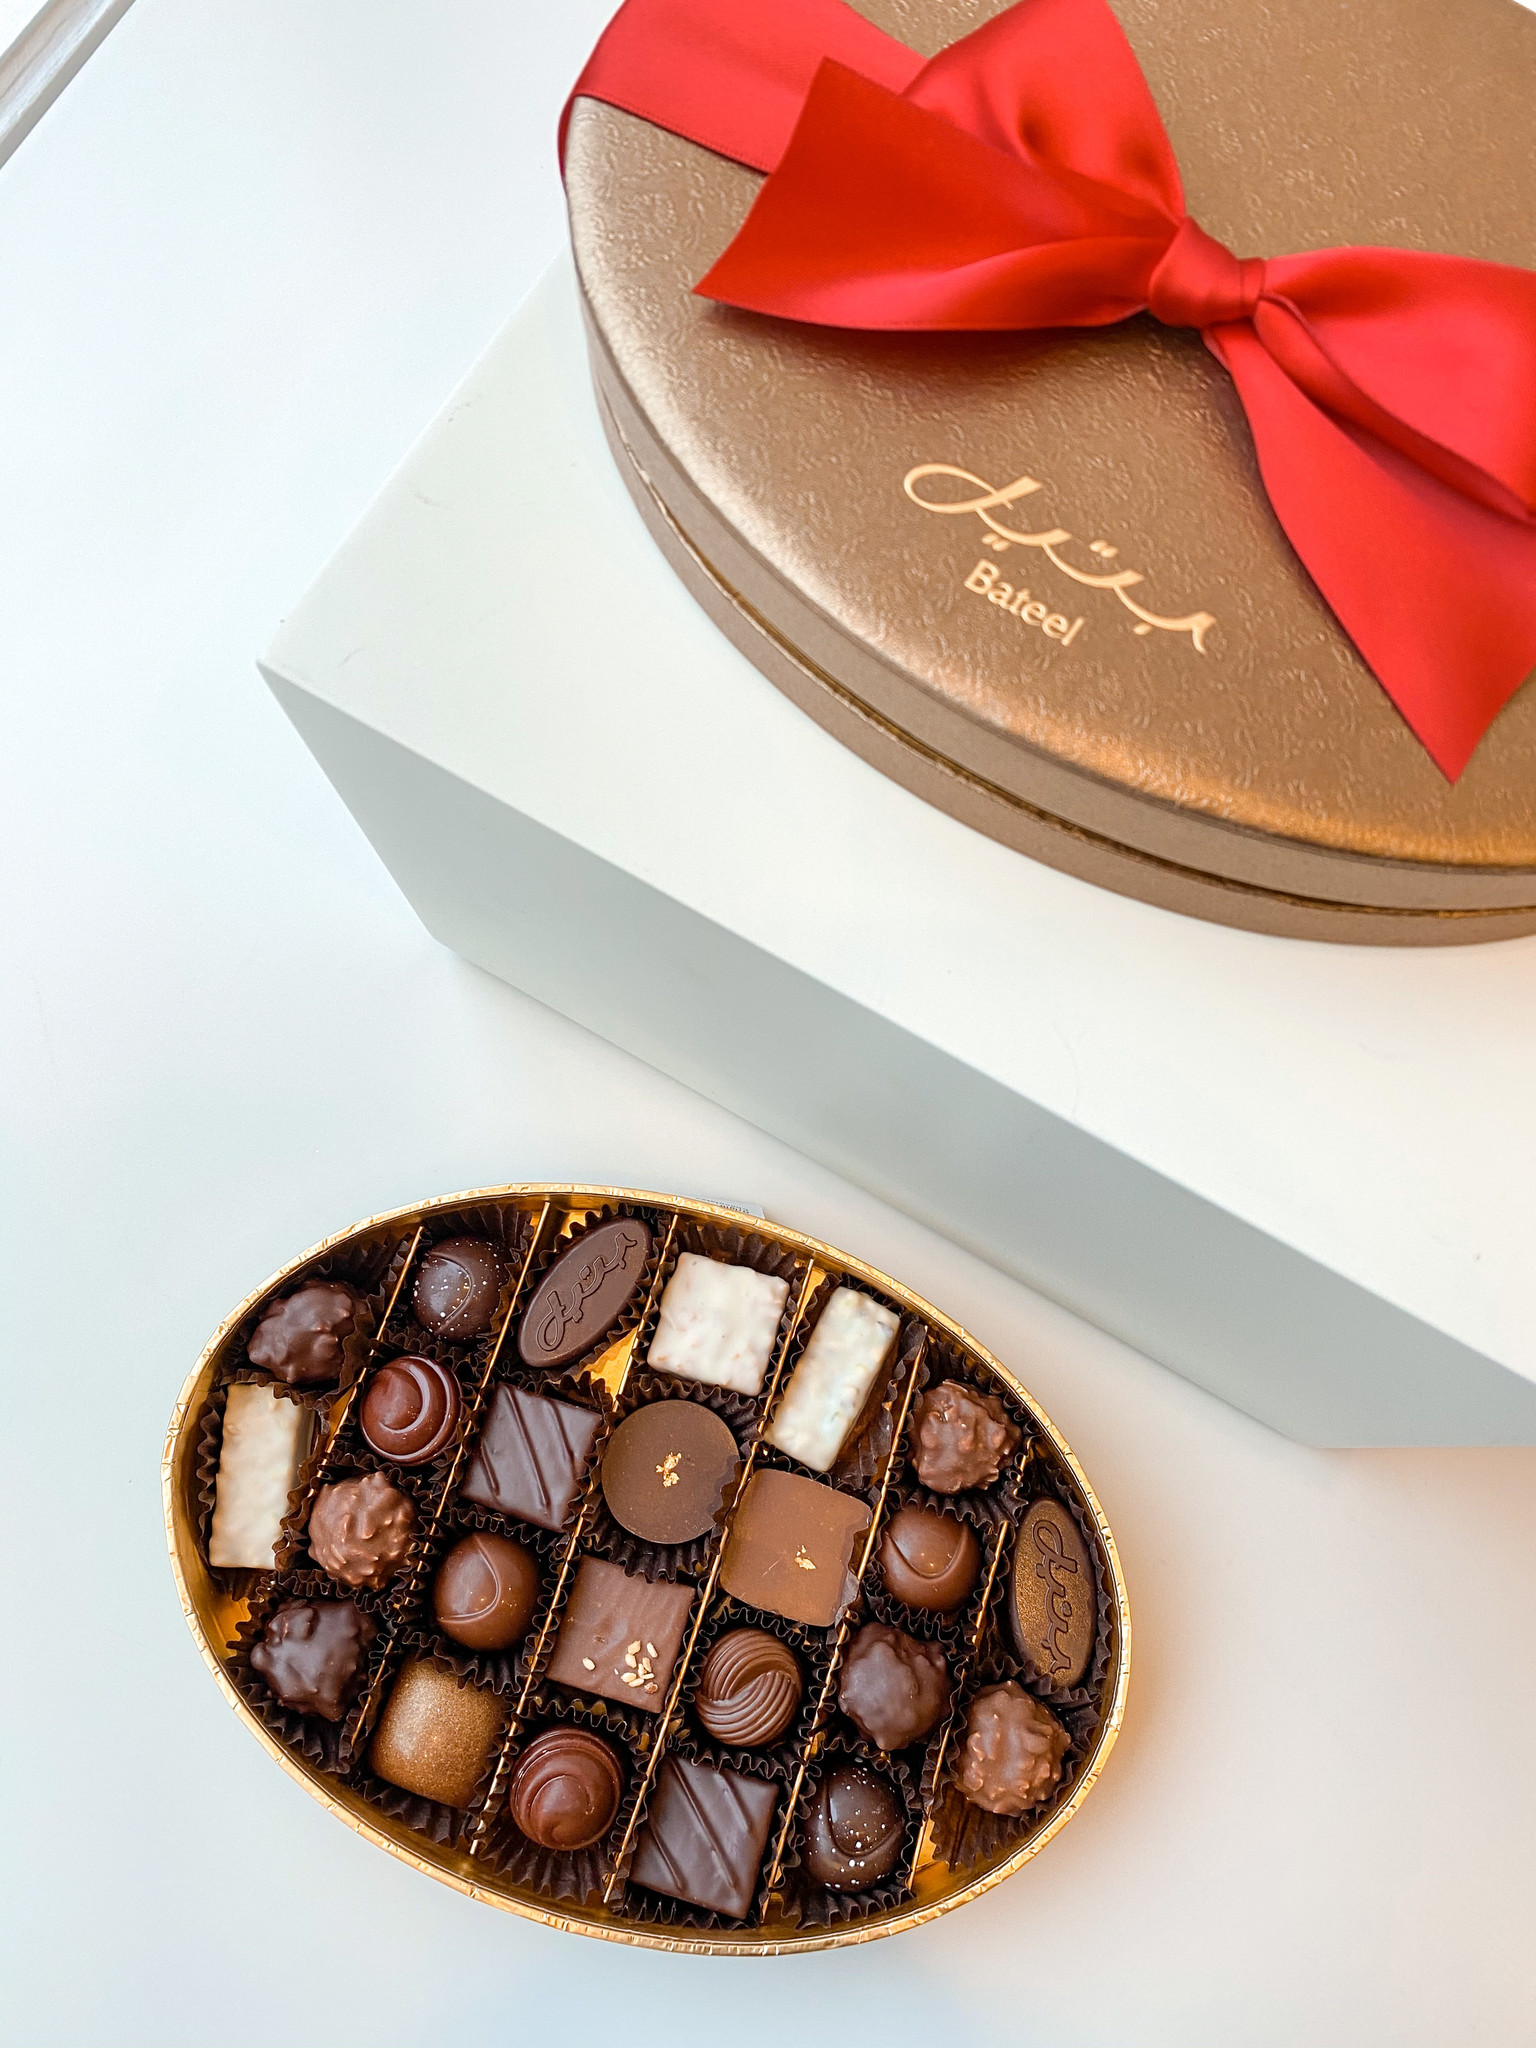 Croco Oval Chocolate Assortment